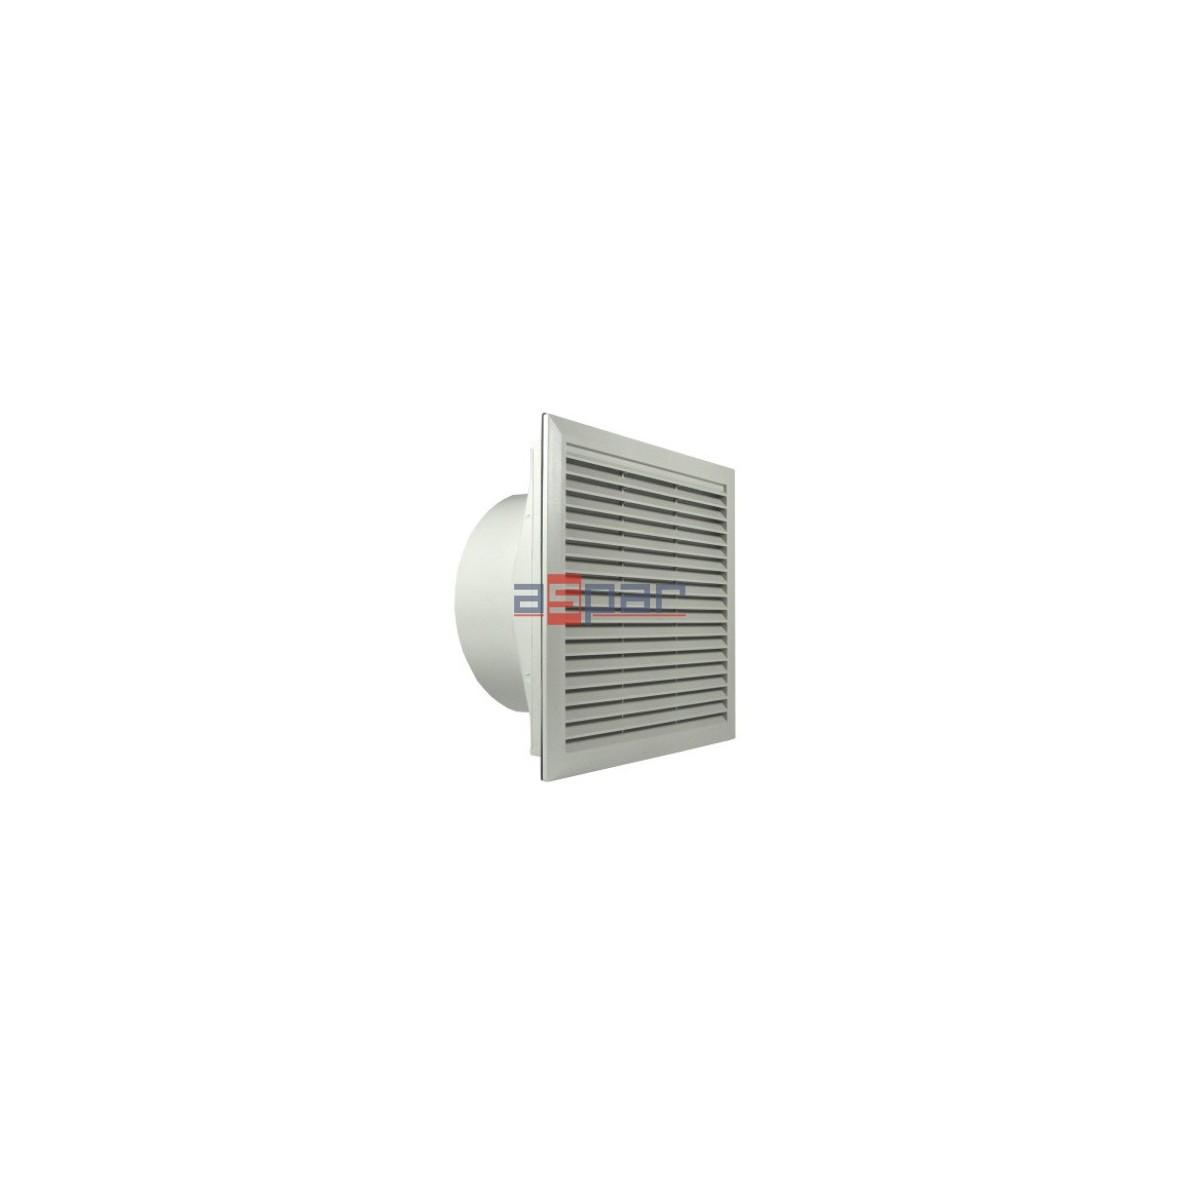 LV 700 230VAC - sucking - filter fan, 323 x 323mm